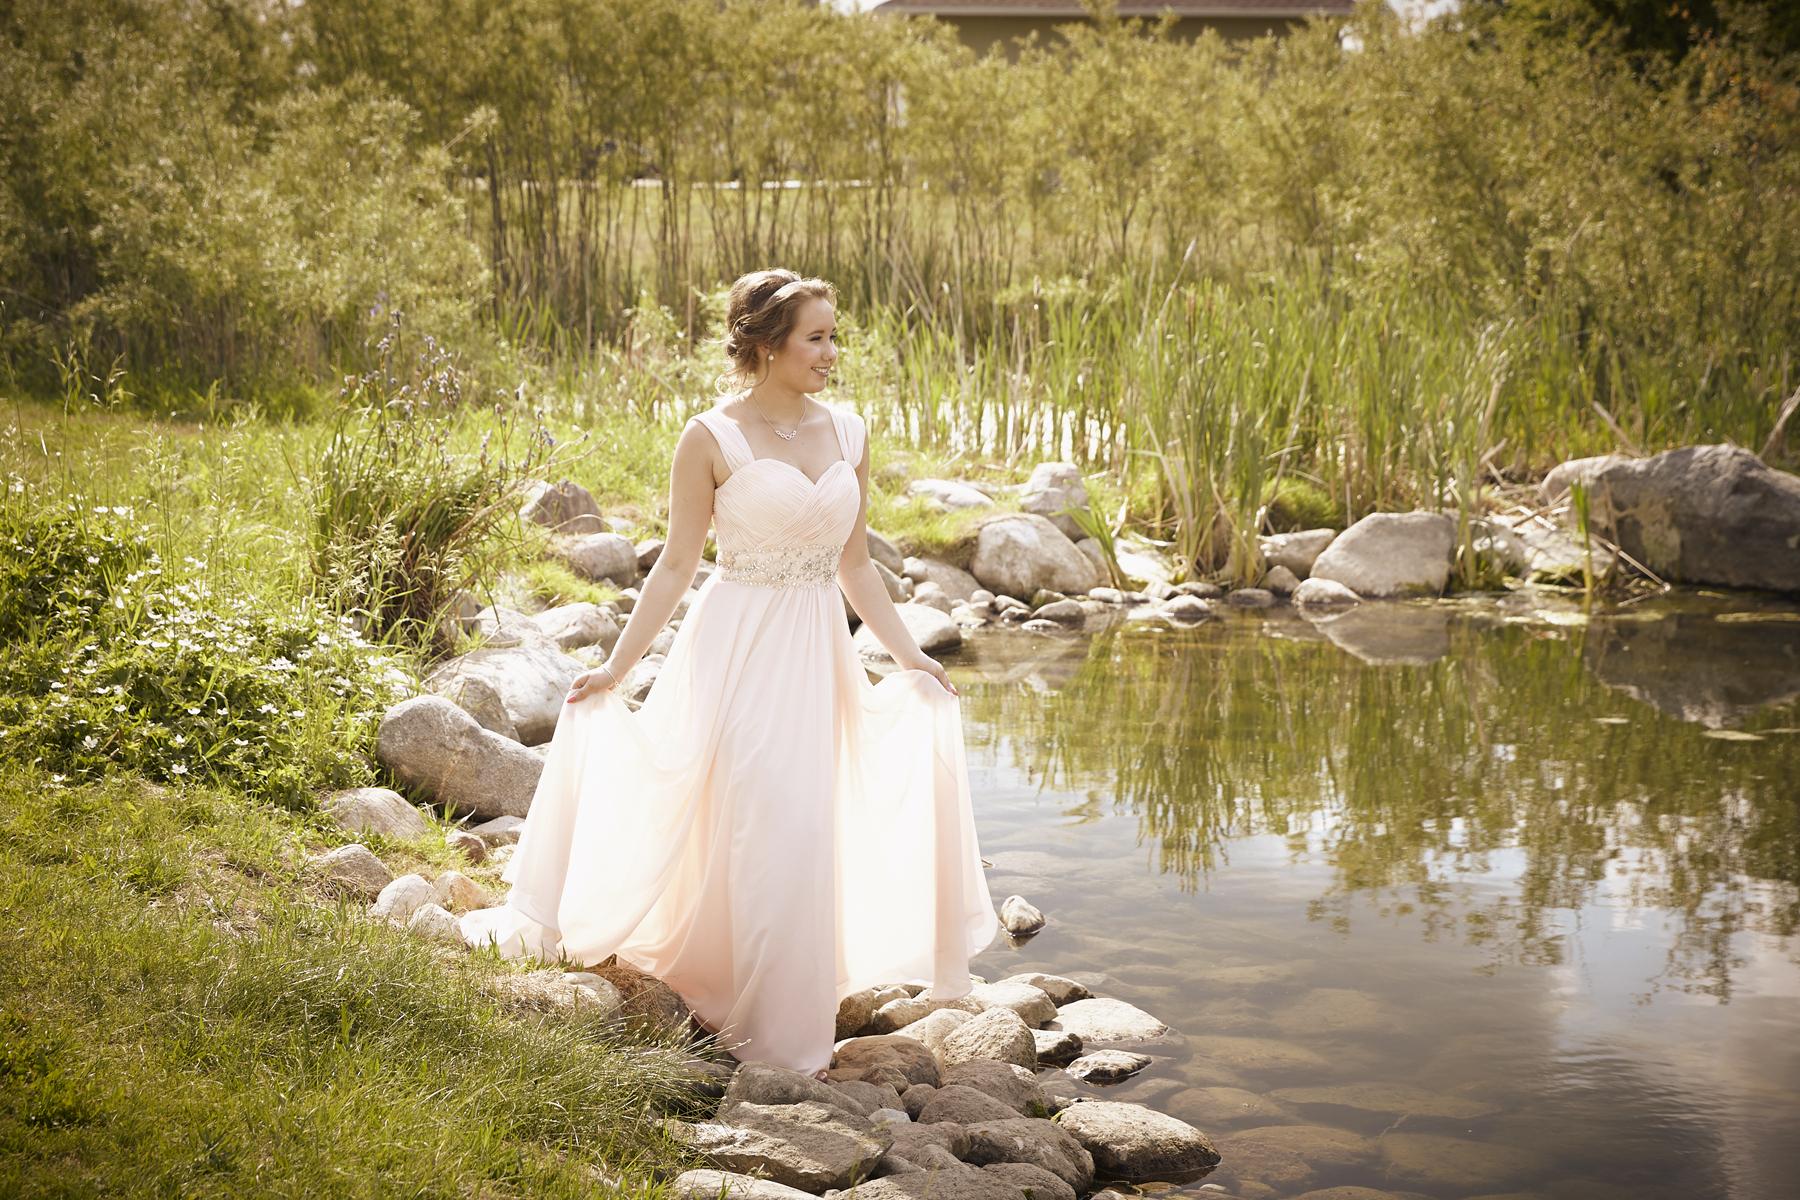 cindy-moleski-professional-graduation-photography-saskatoon-saskatchewan-29359-59e.jpg